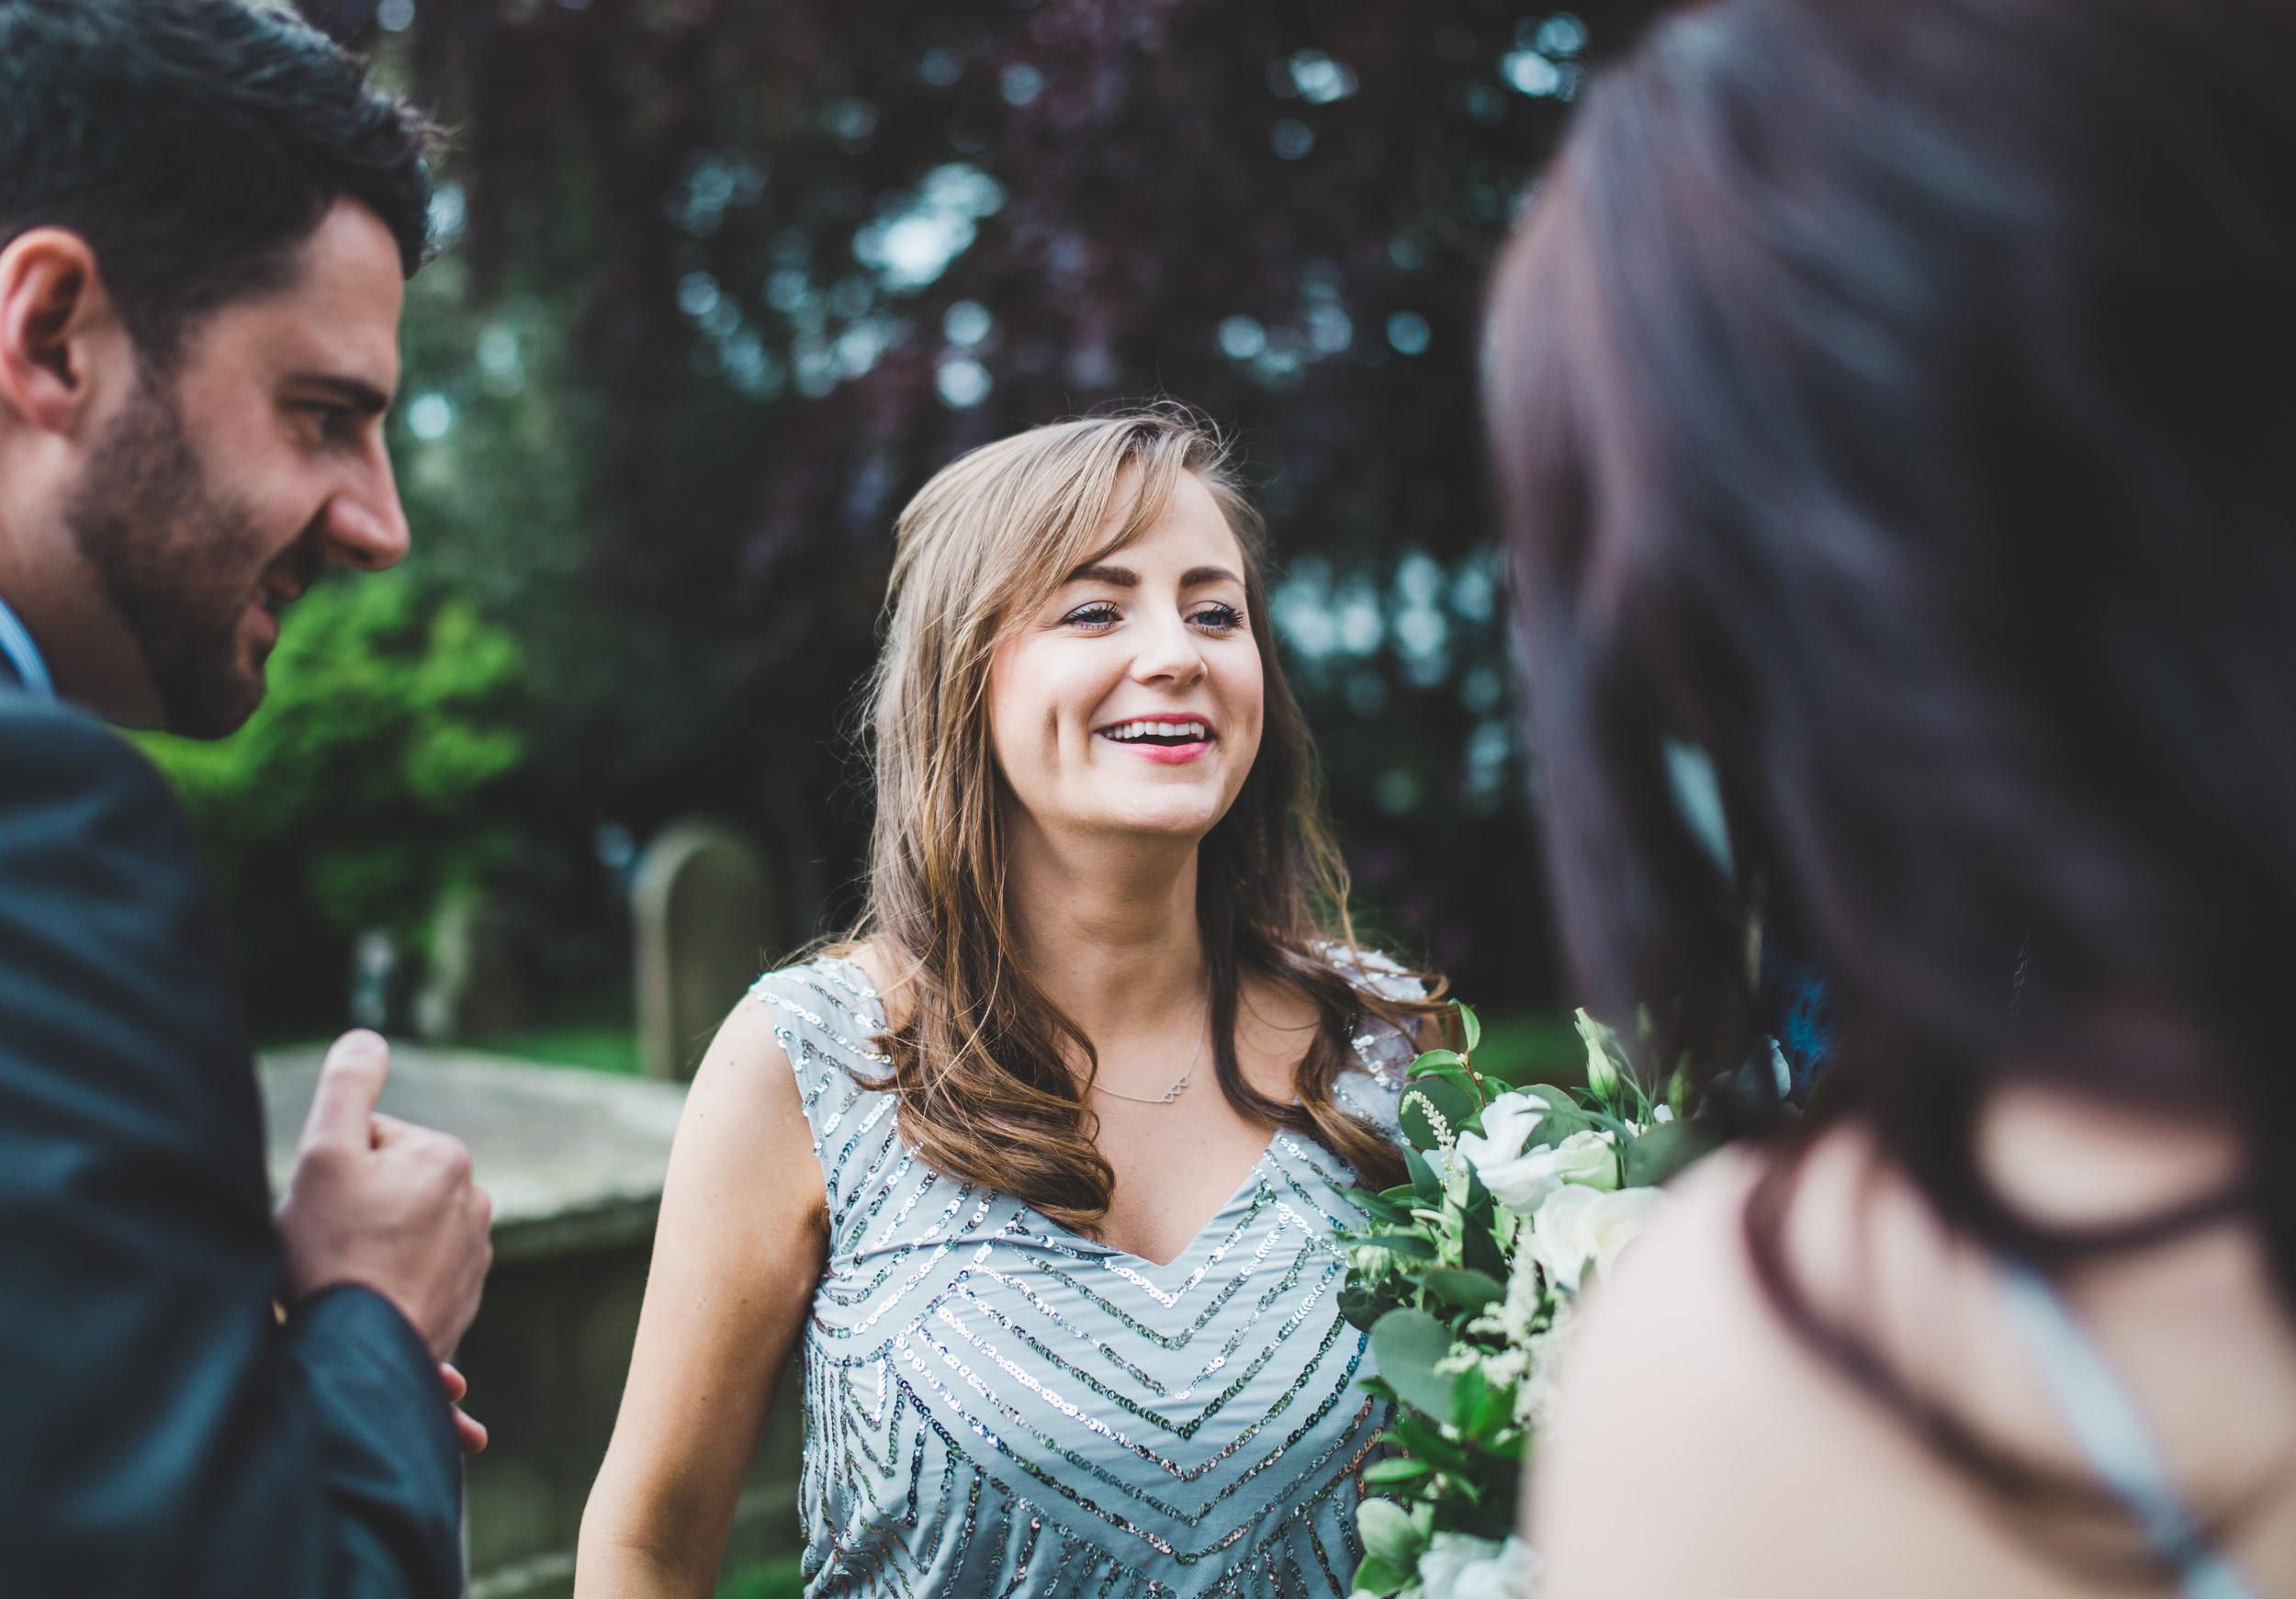 documentary wedding photography Cheshire - bridesmaid outside church